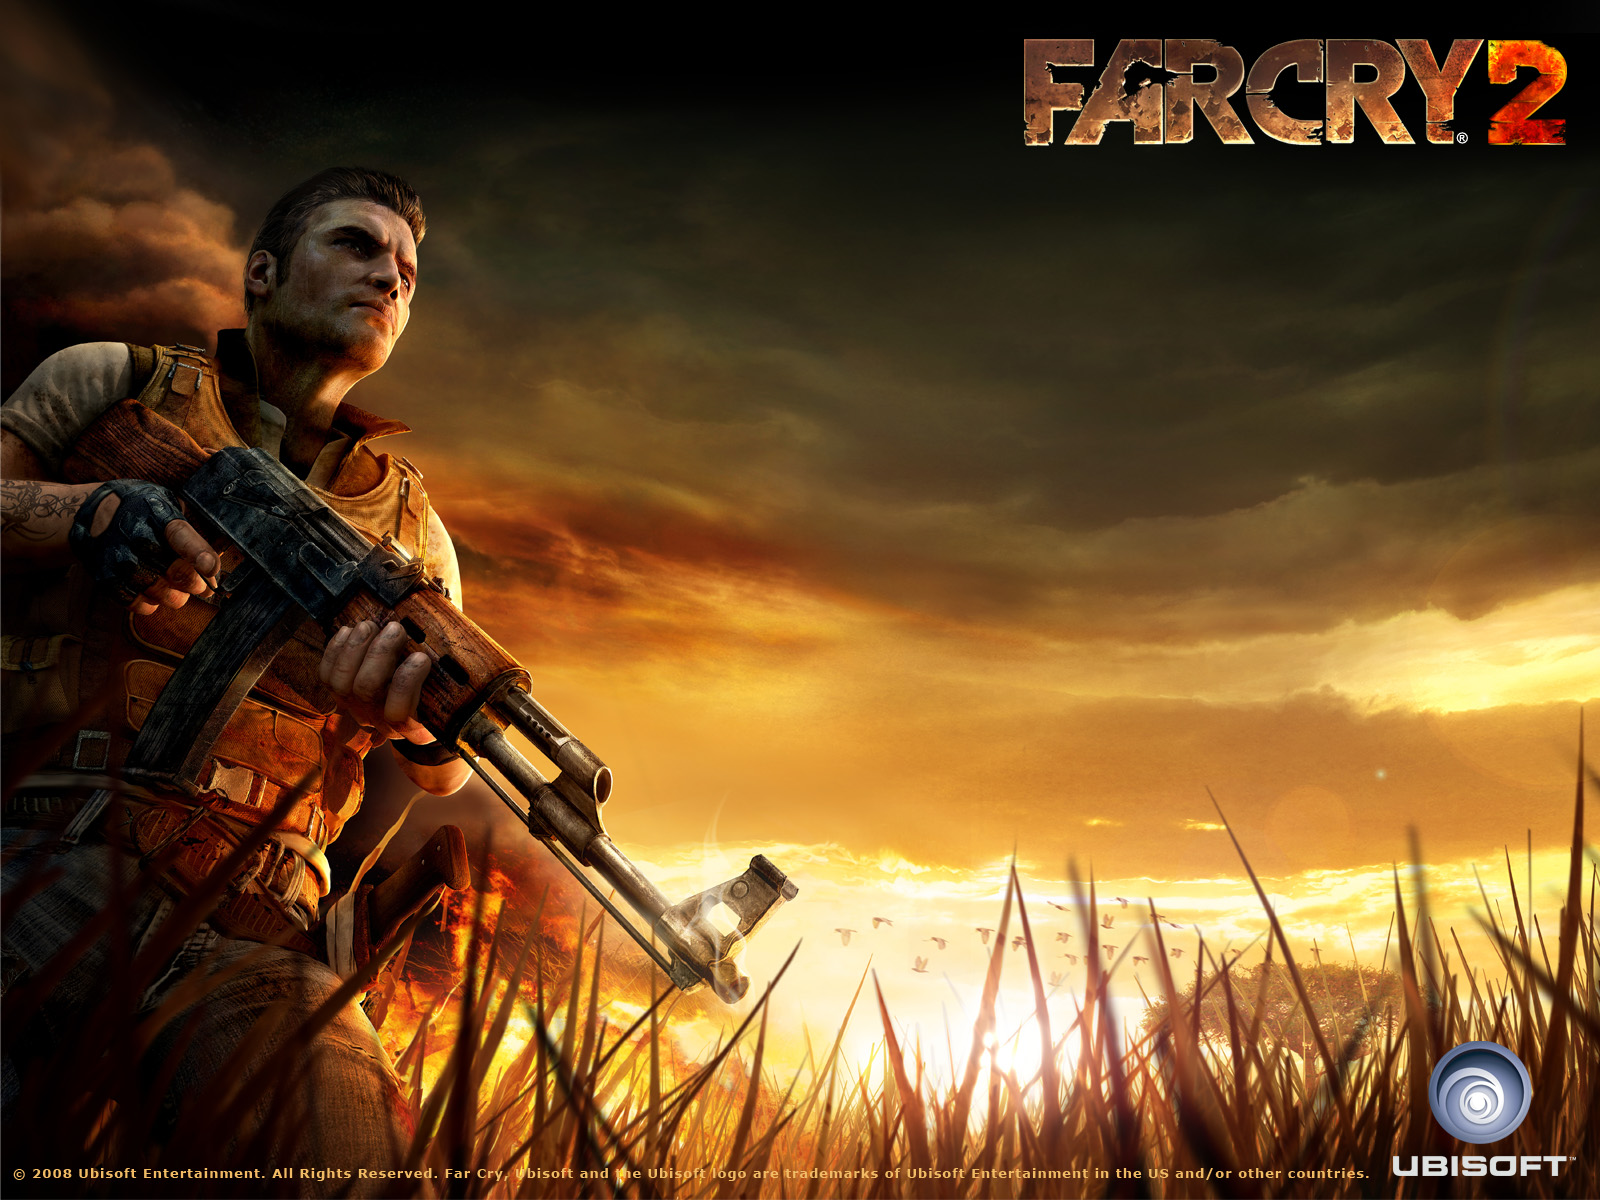 Free Download Far Cry 2 Pc Game Computer Desktop Wallpaper Far Cry 2 Pc Game 1600x1200 For Your Desktop Mobile Tablet Explore 49 Download Wallpaper Game Pc